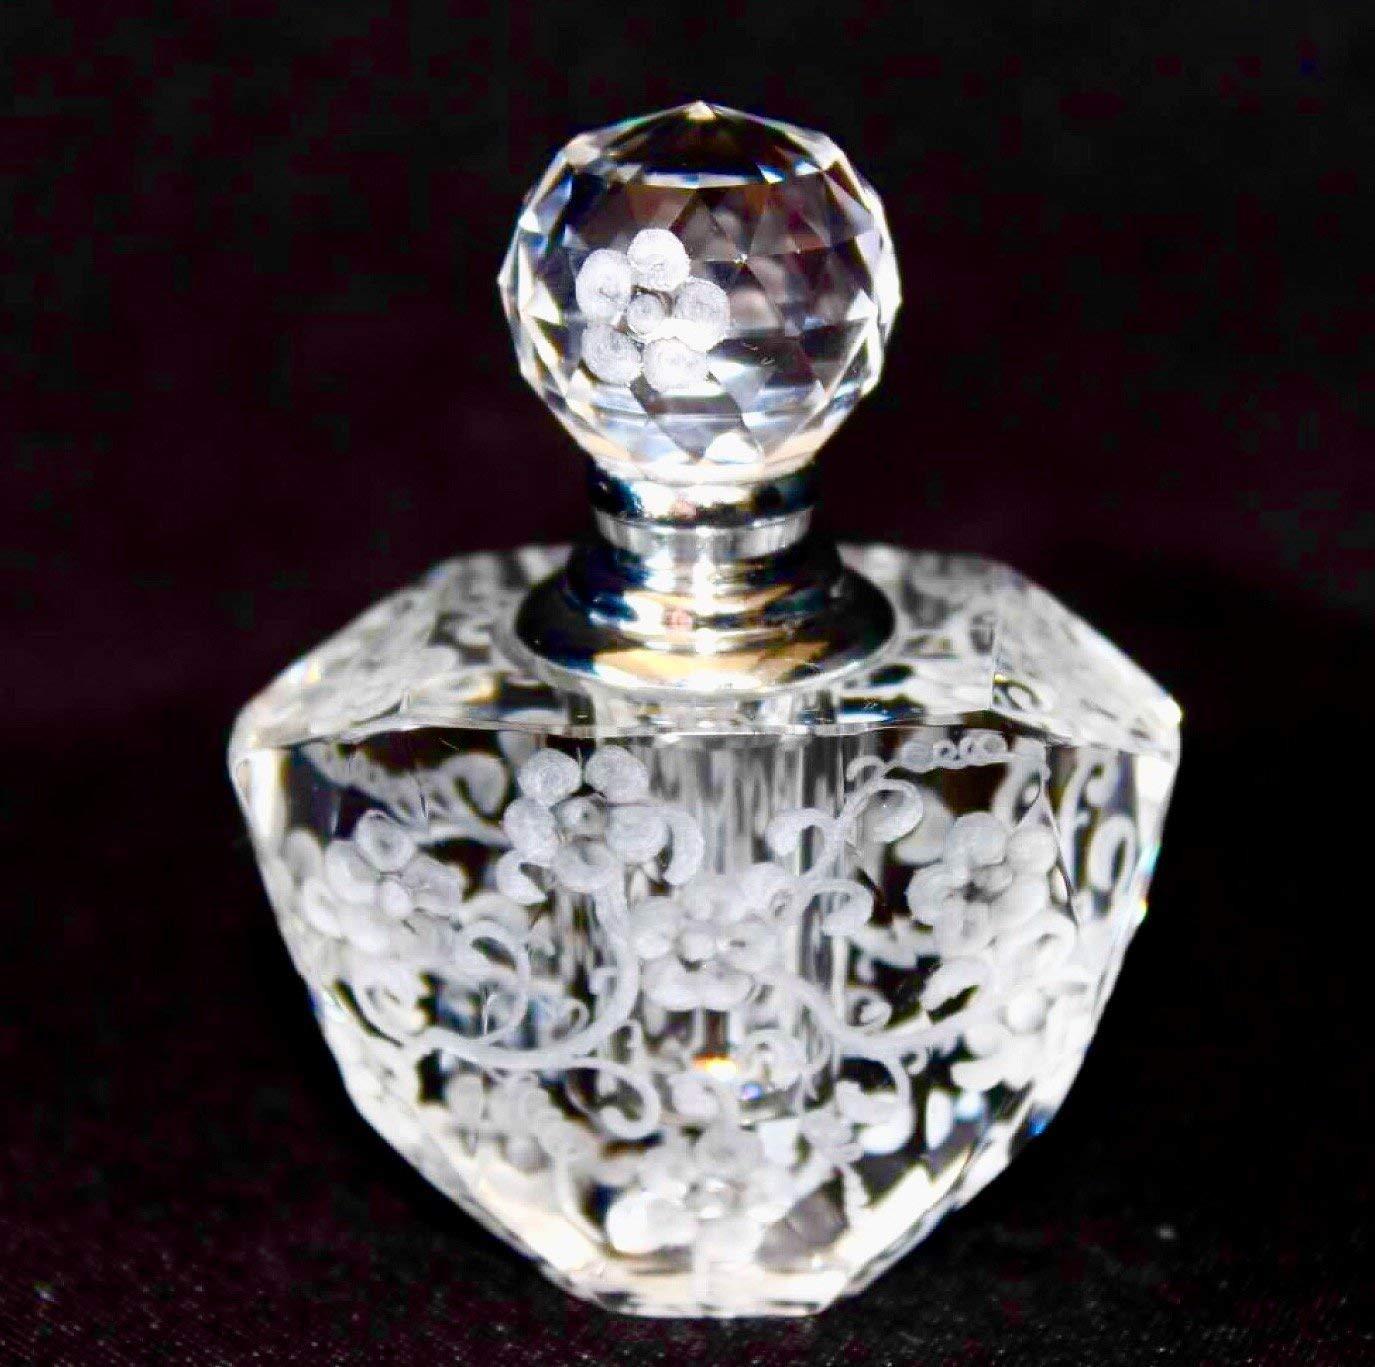 Cheap Lead Crystal Perfume Bottle Find Lead Crystal Perfume Bottle